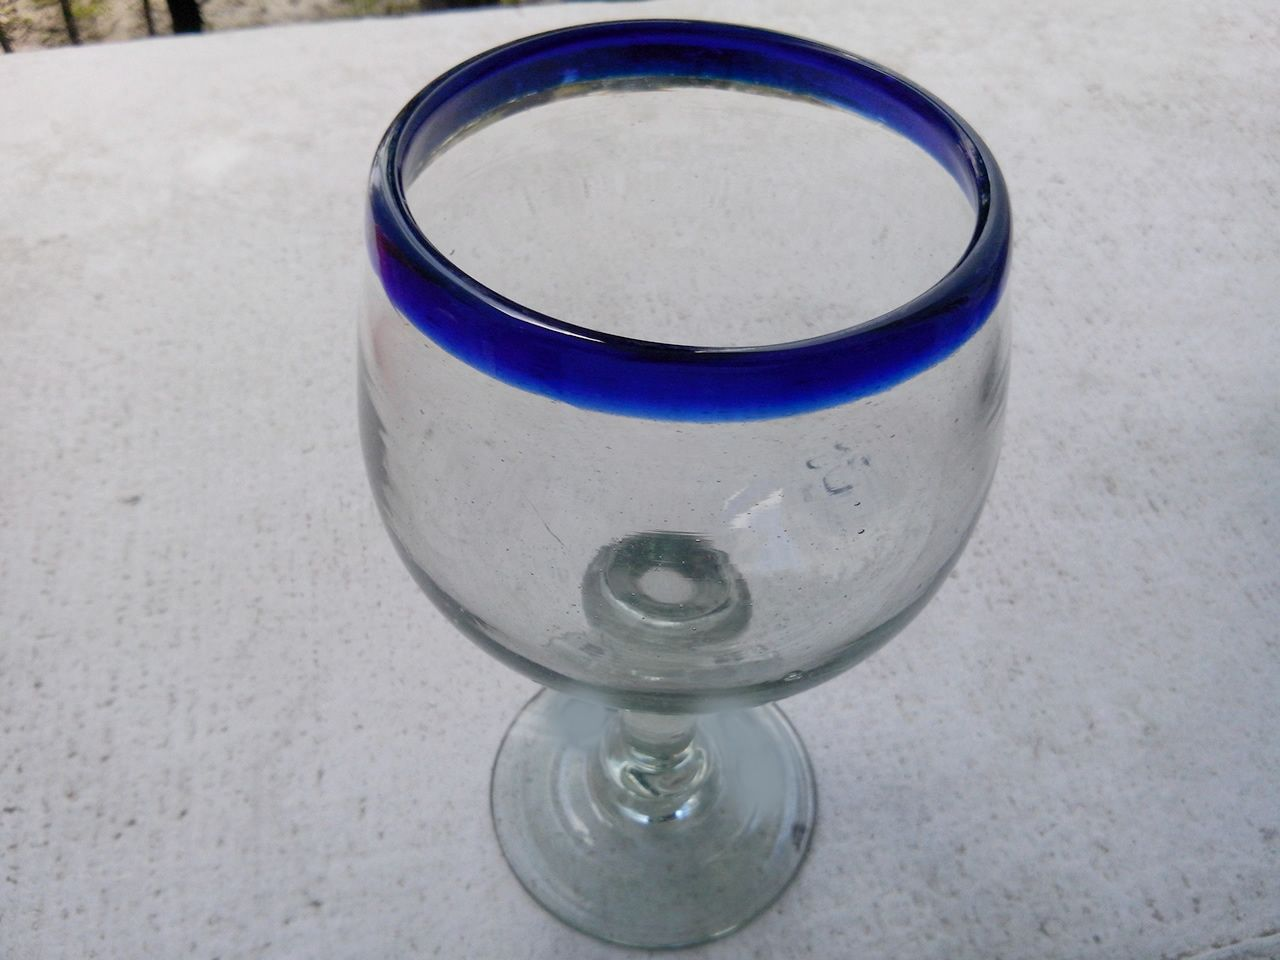 Copa bola de vidrio soplado mediana. Más info en: www.artesaniasdetonala.com